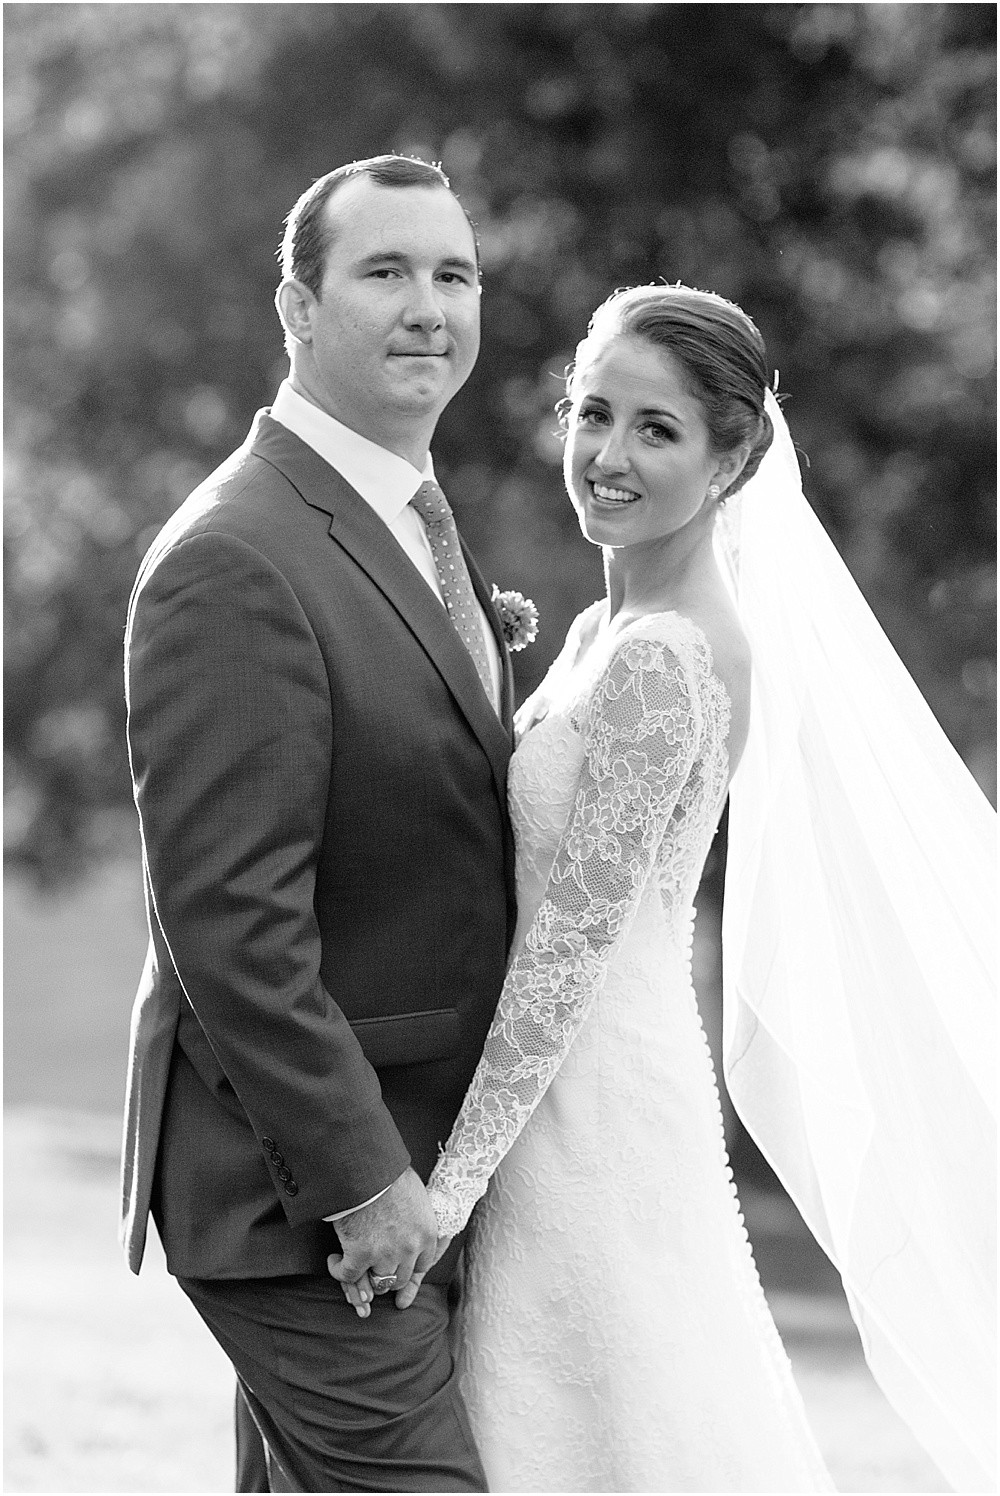 Vane_Baltimore_Country_Club_Wedding_Baltimore_Wedding_Photographer_0145